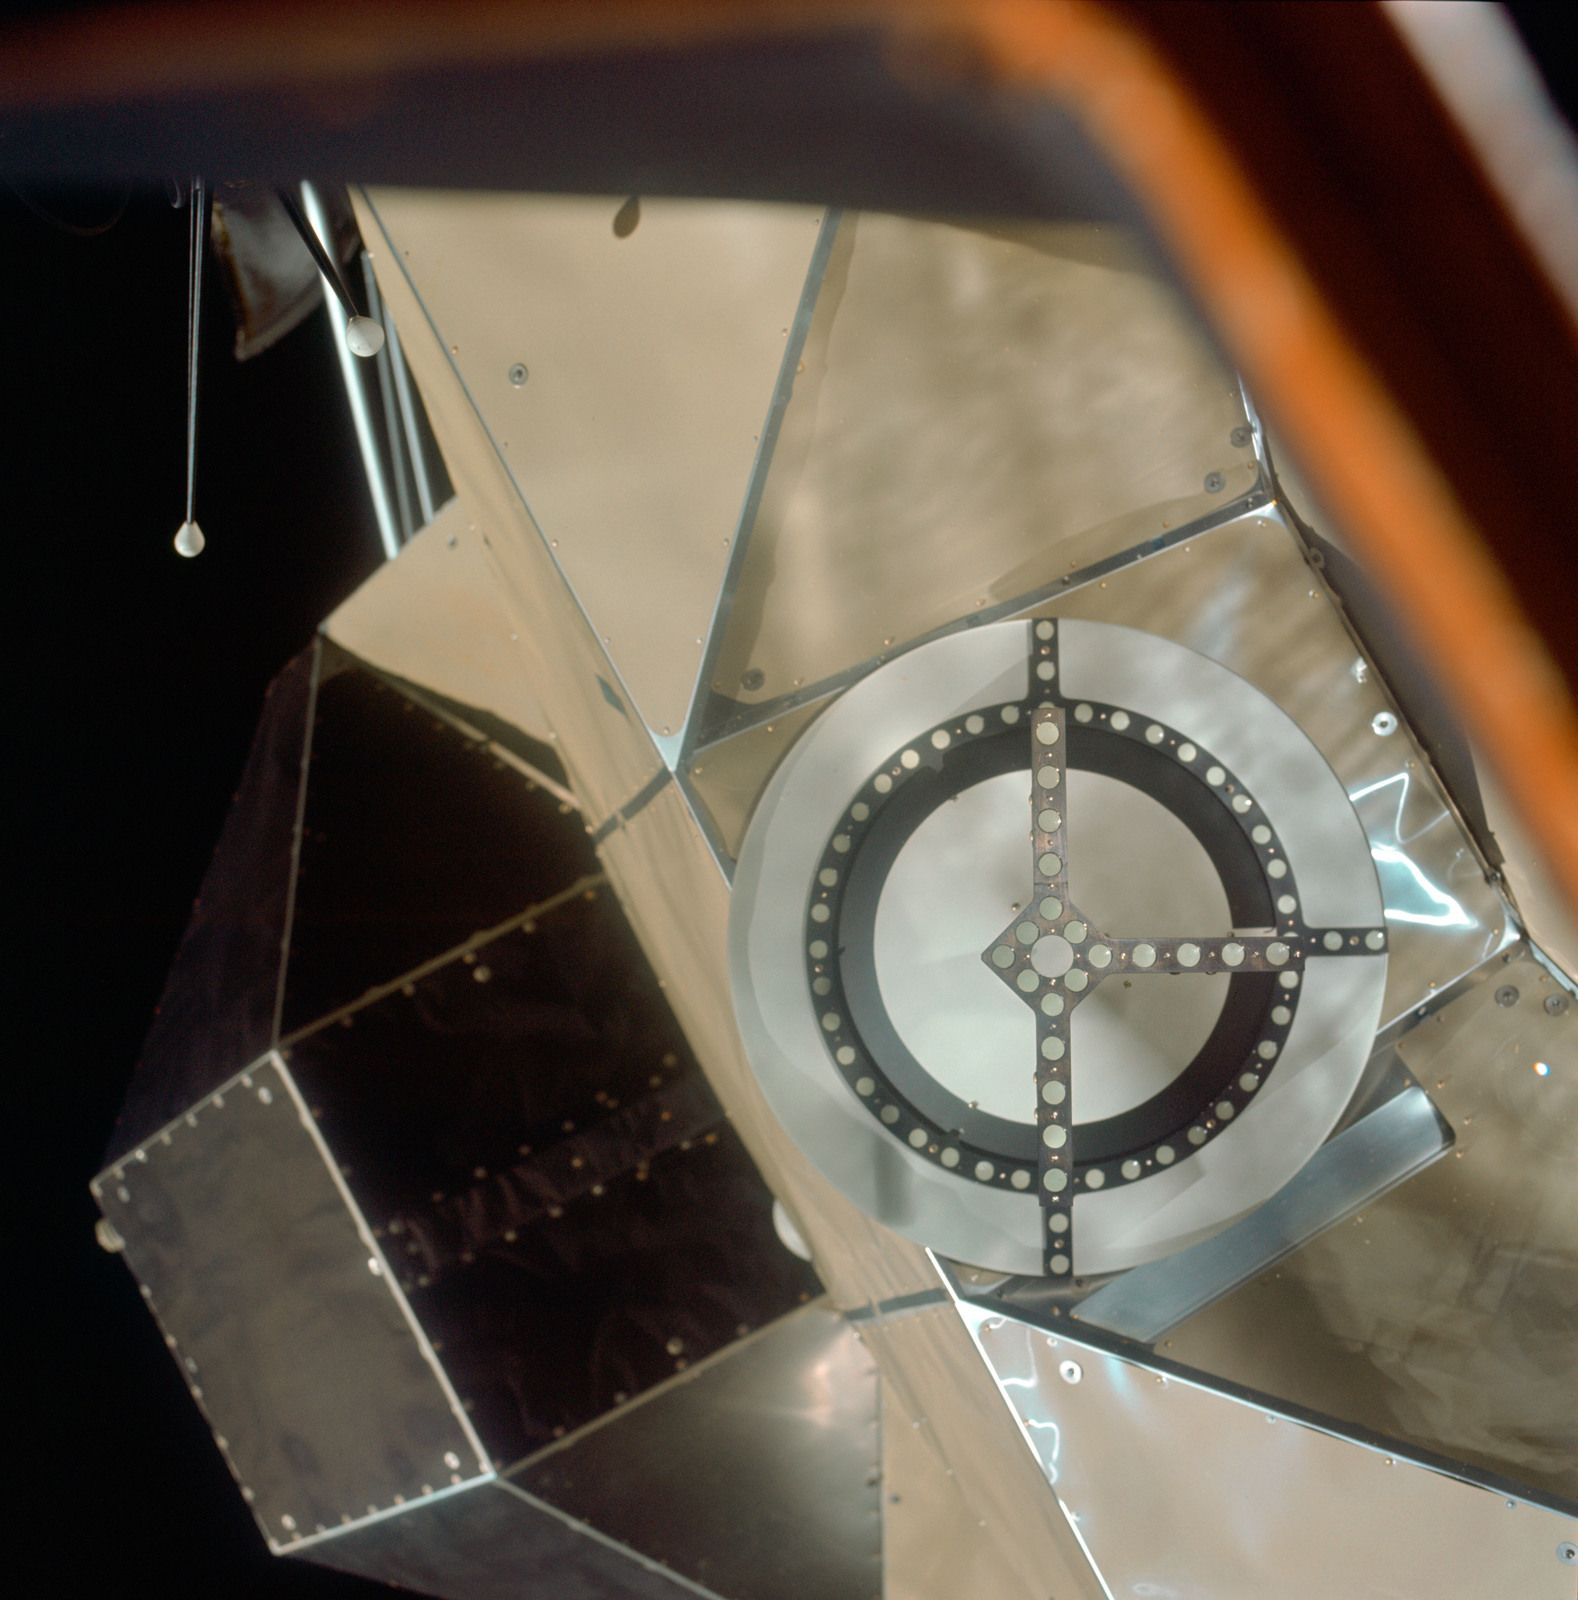 AS11-36-5365 - Apollo 11 - Apollo 11 Mission image - Lunar Module (LM) Docking Target